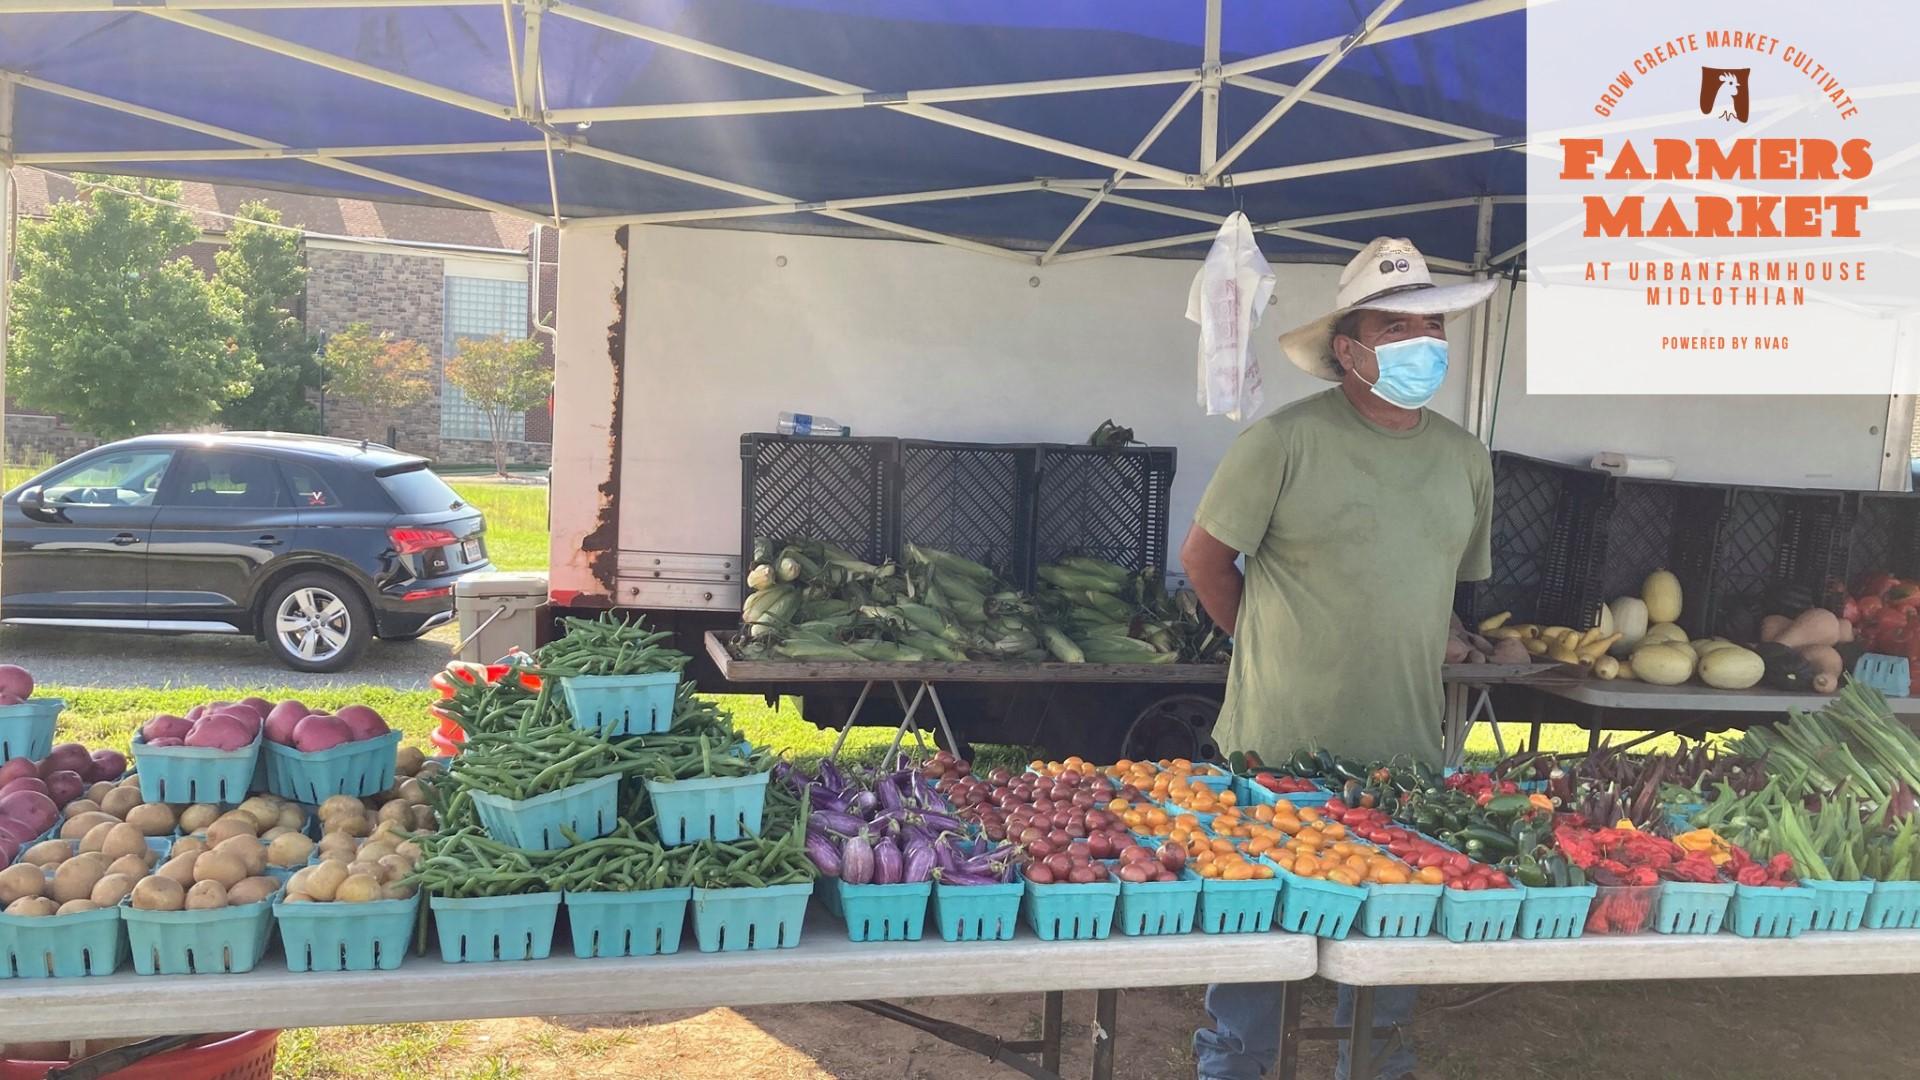 Farmers Market Urban Farmhouse Midlothian